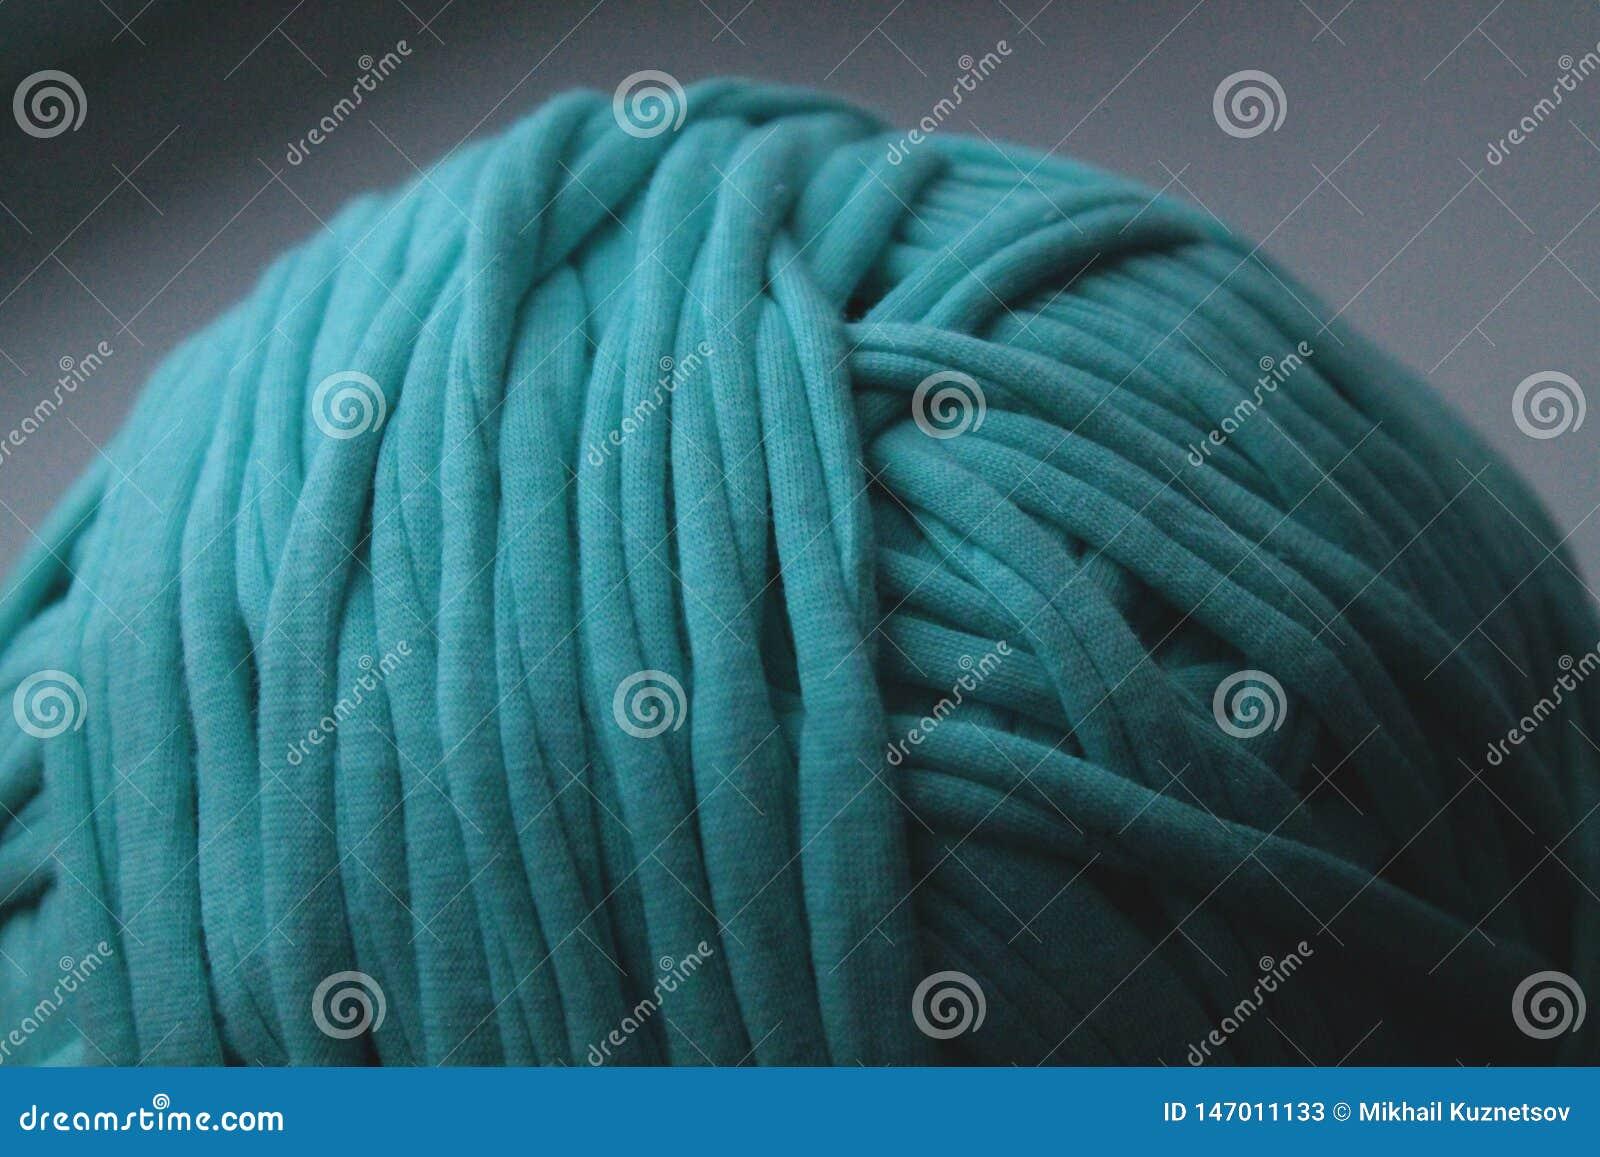 Sluit omhoog mening van groene clew draad voor het breien